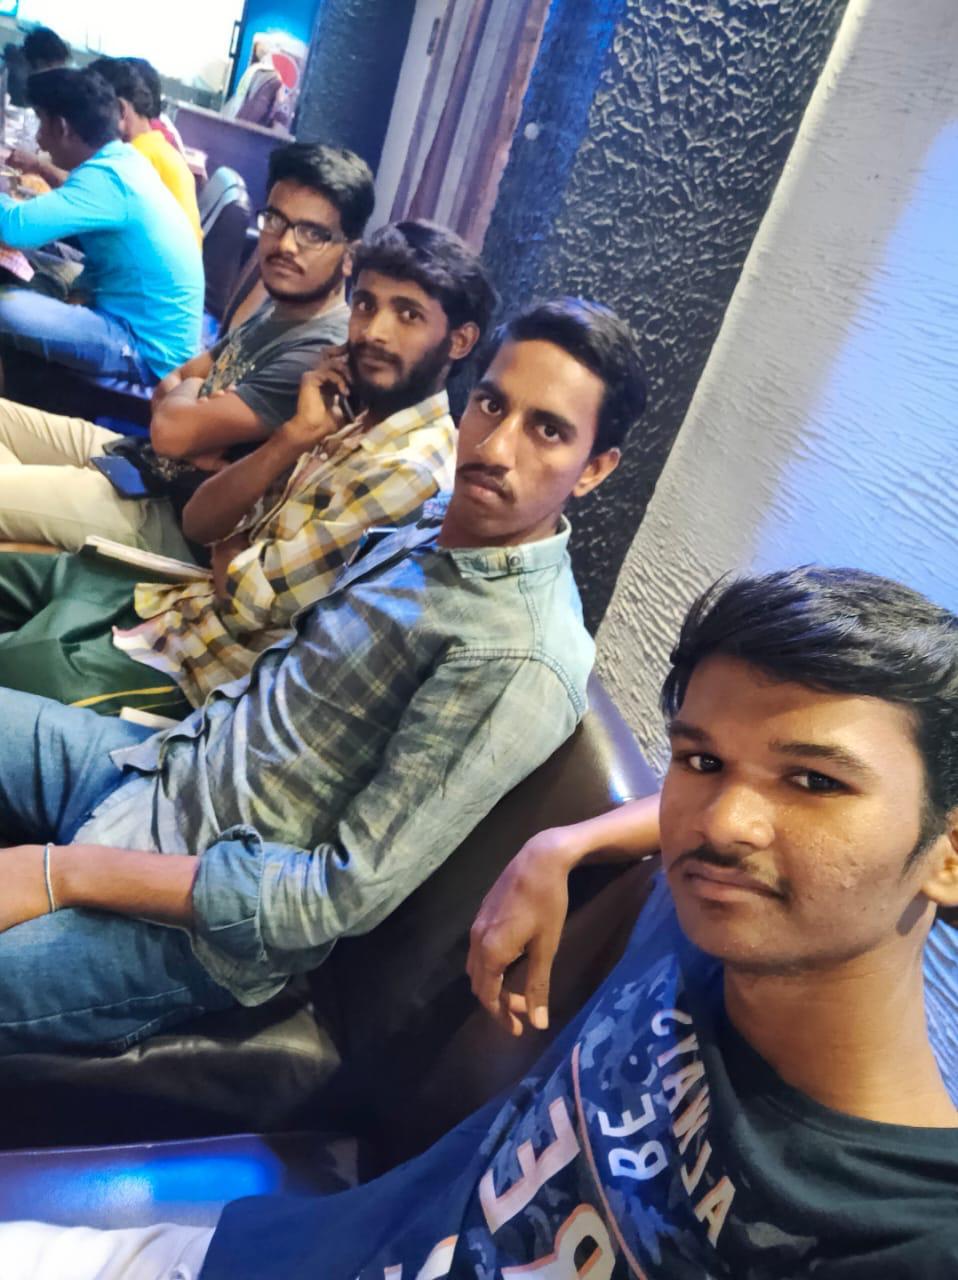 WhatsApp Image 2019-08-26 at 4.56.26 PM